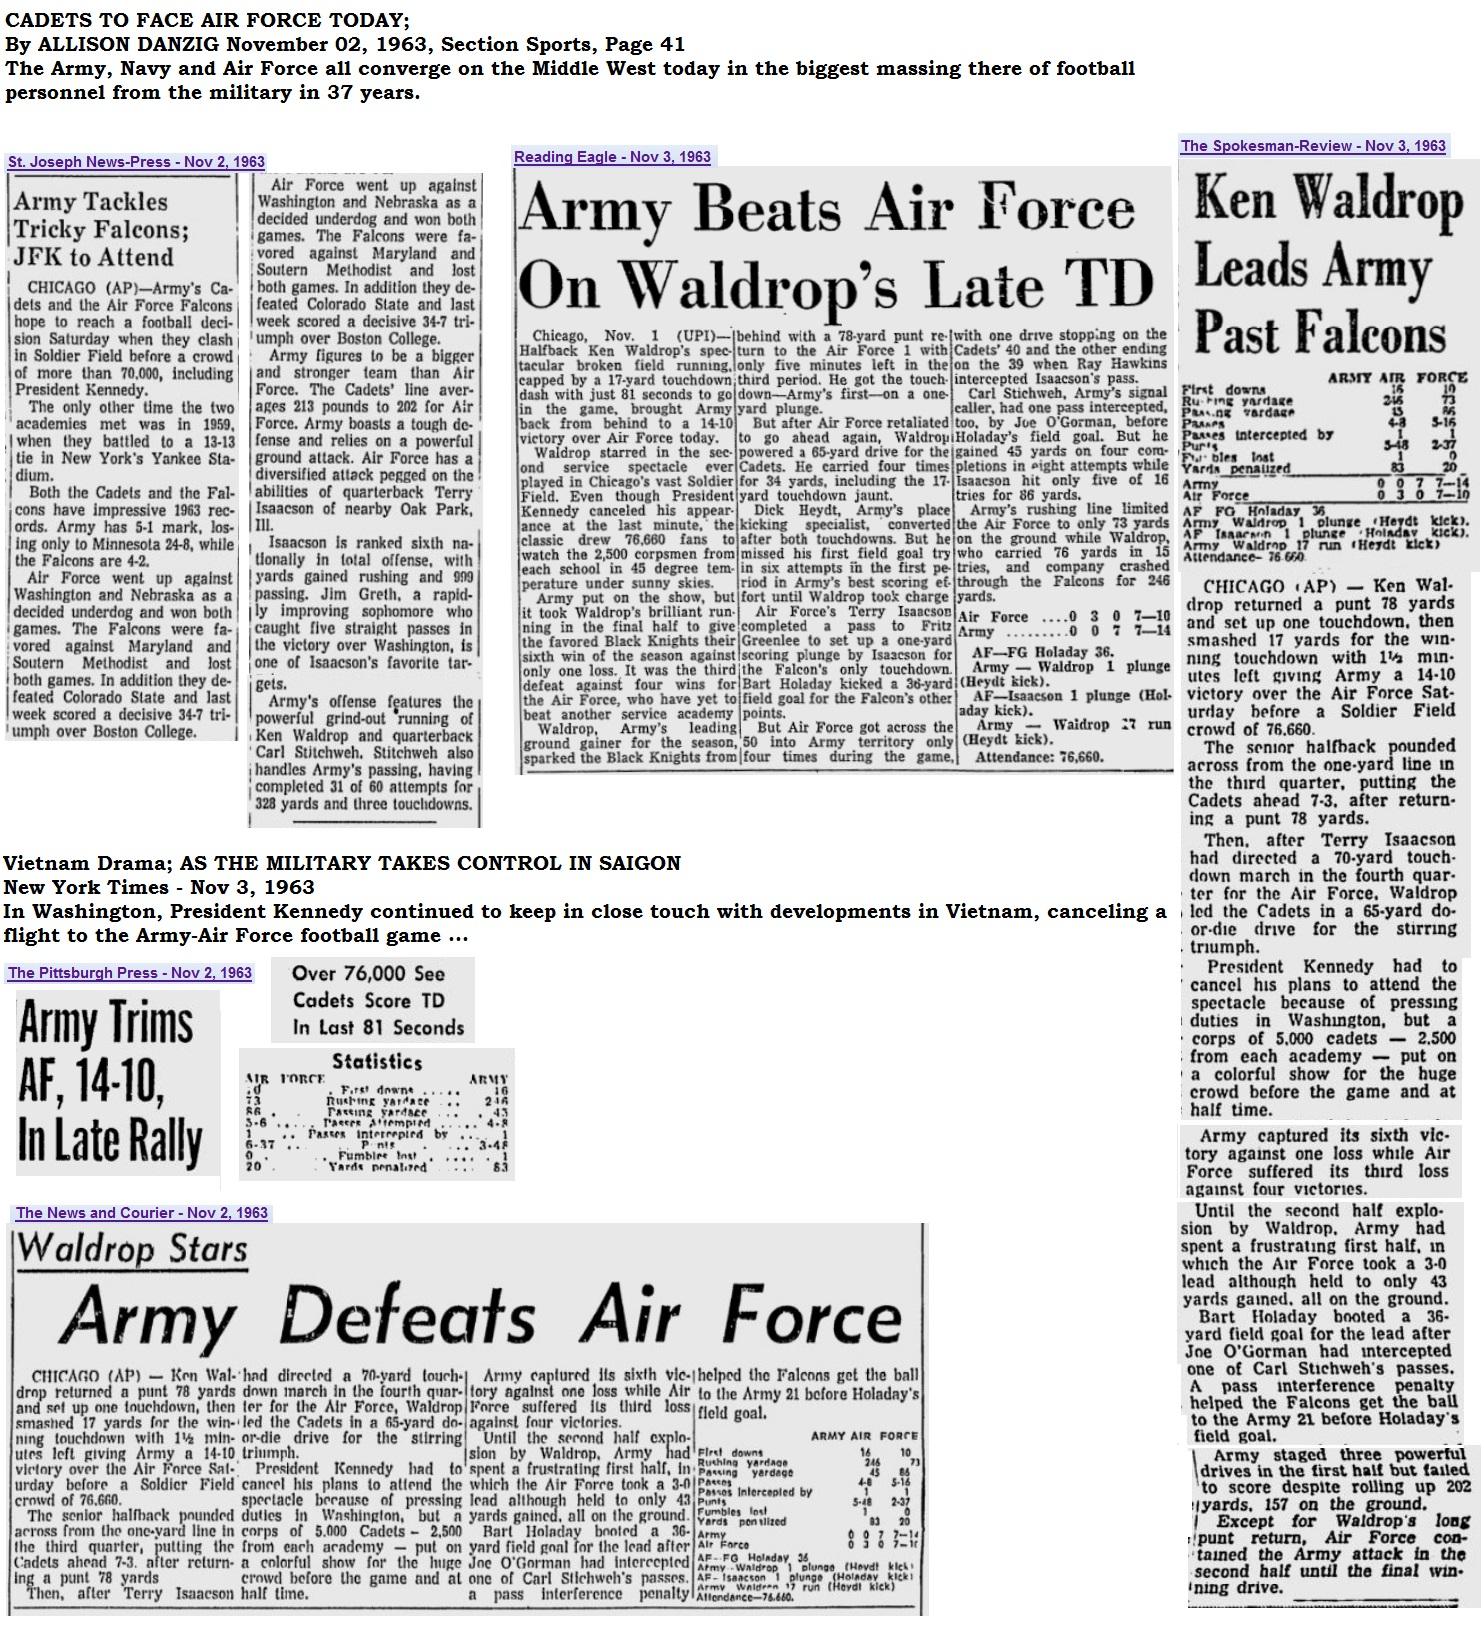 armyfb_1963_vsaf_various_nov31963